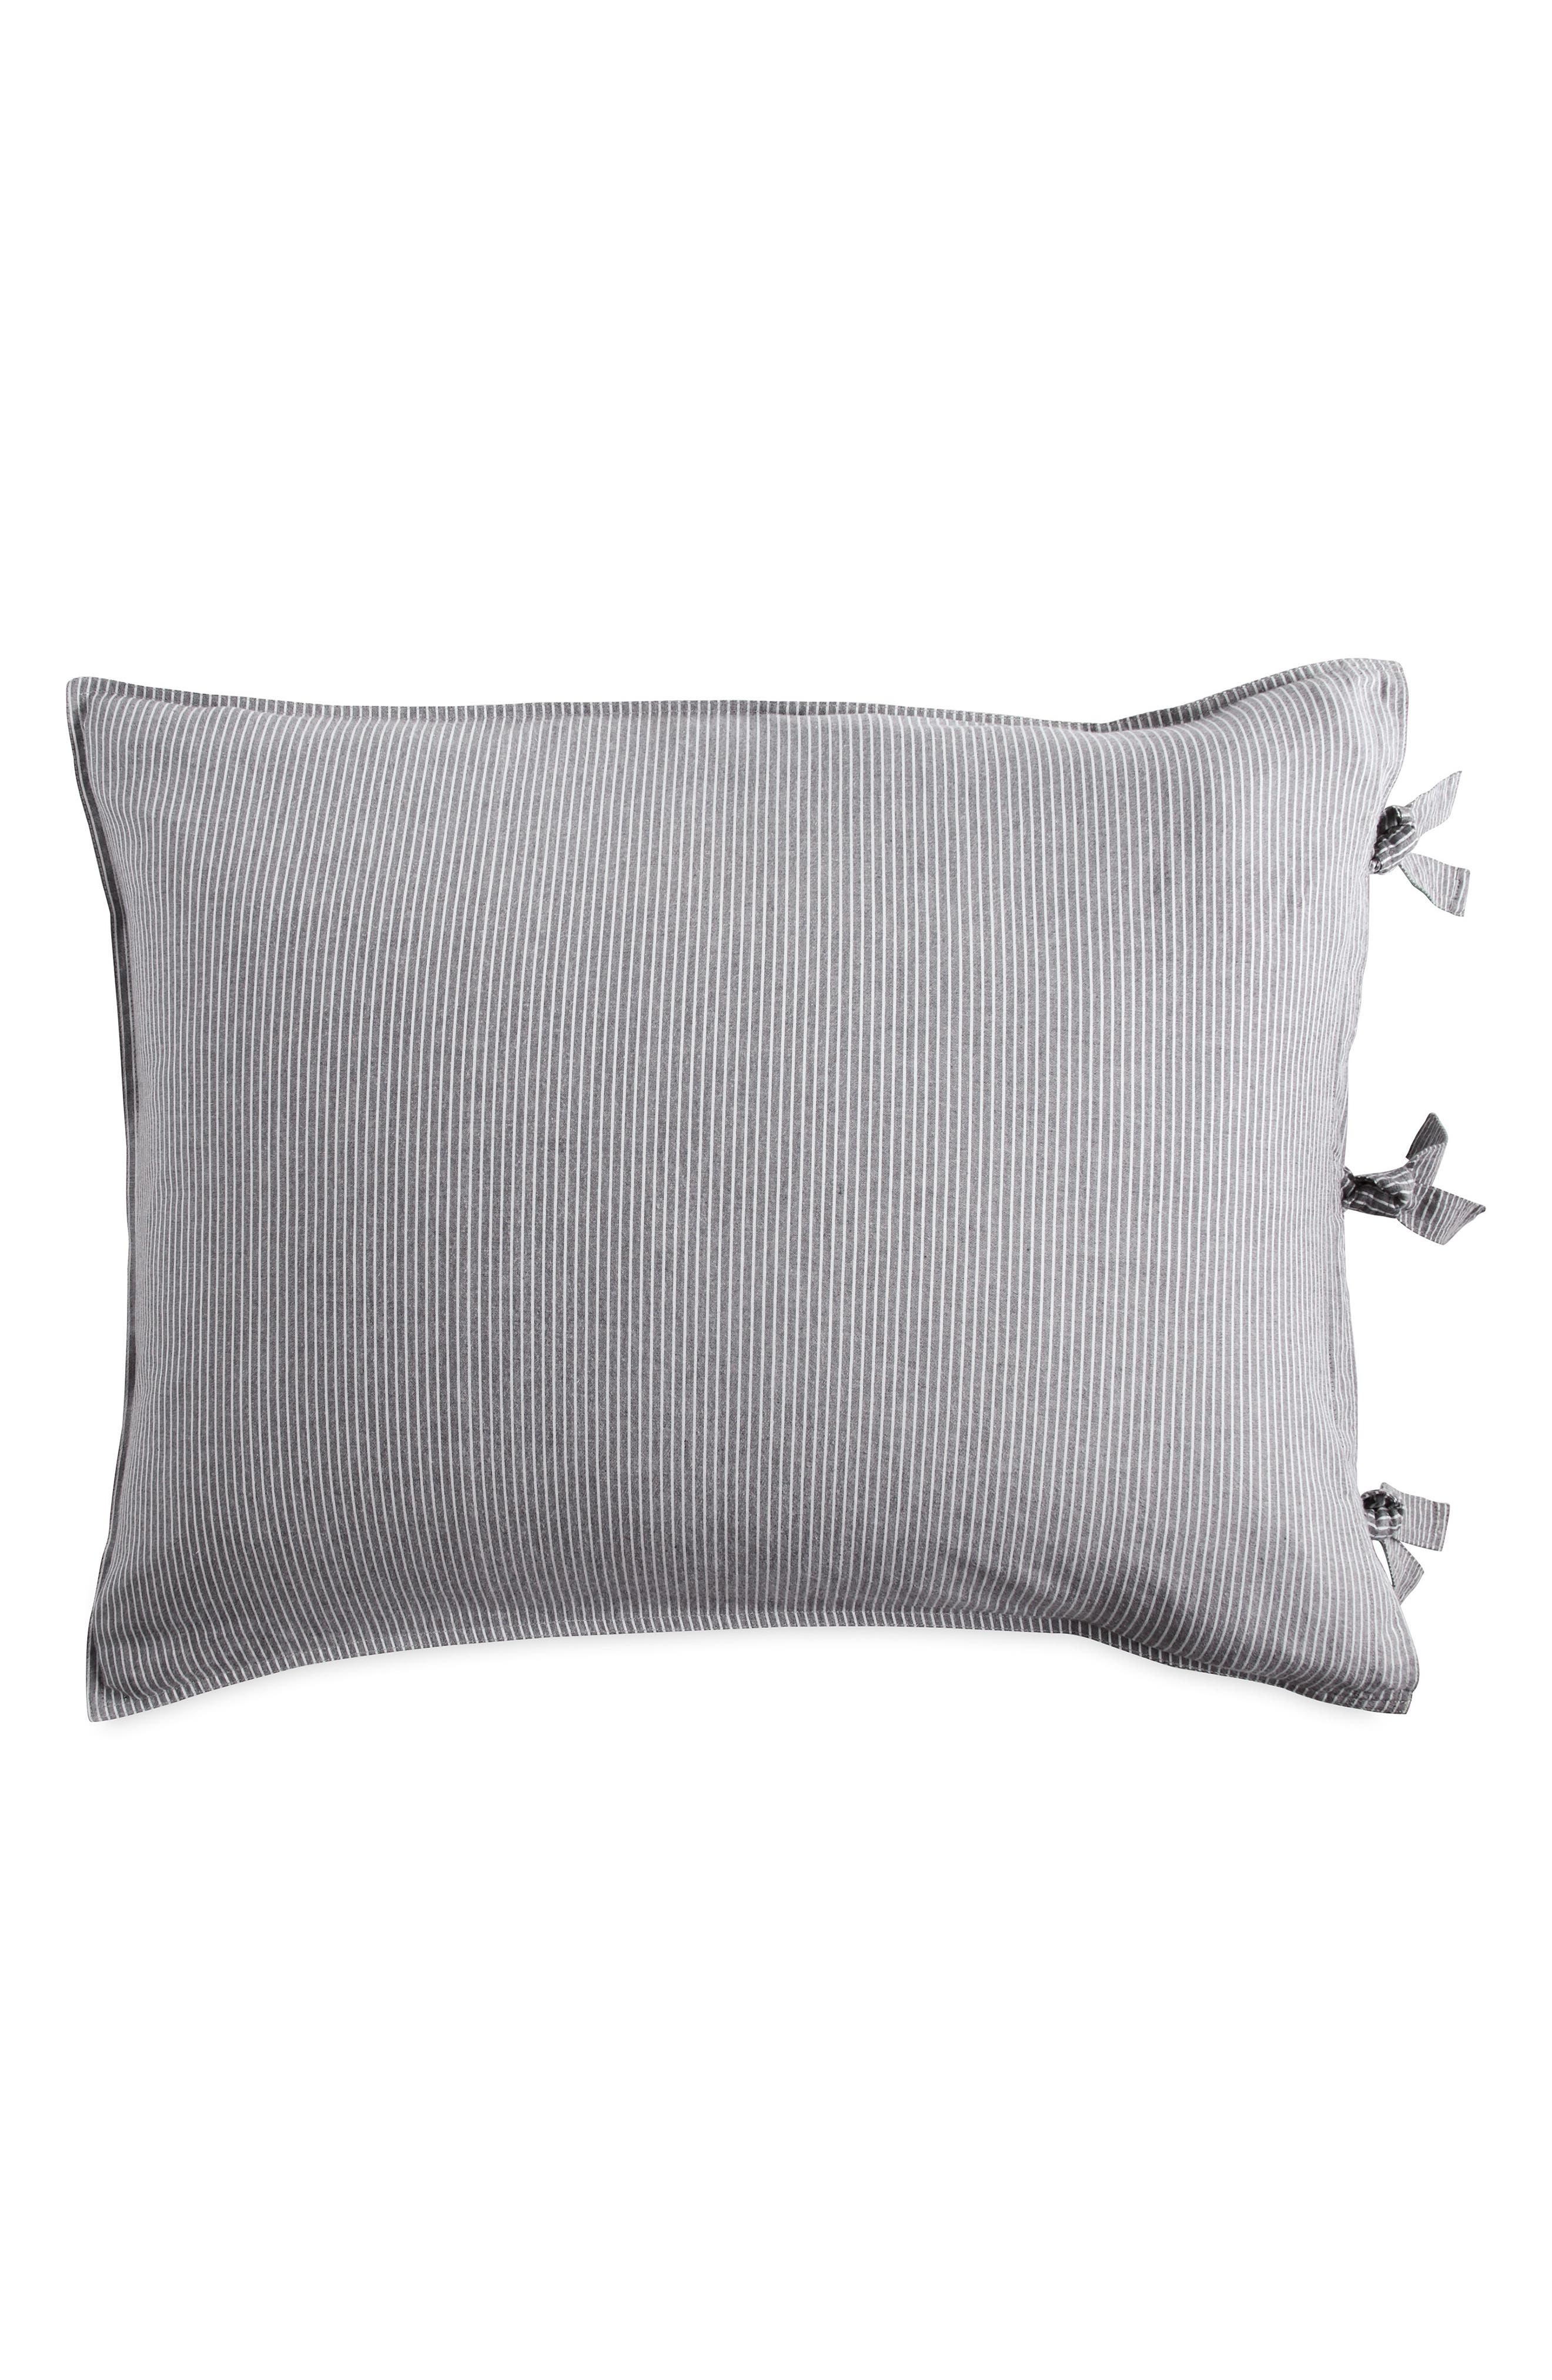 DKNY, PURE Stripe Pillow Sham, Main thumbnail 1, color, GREY